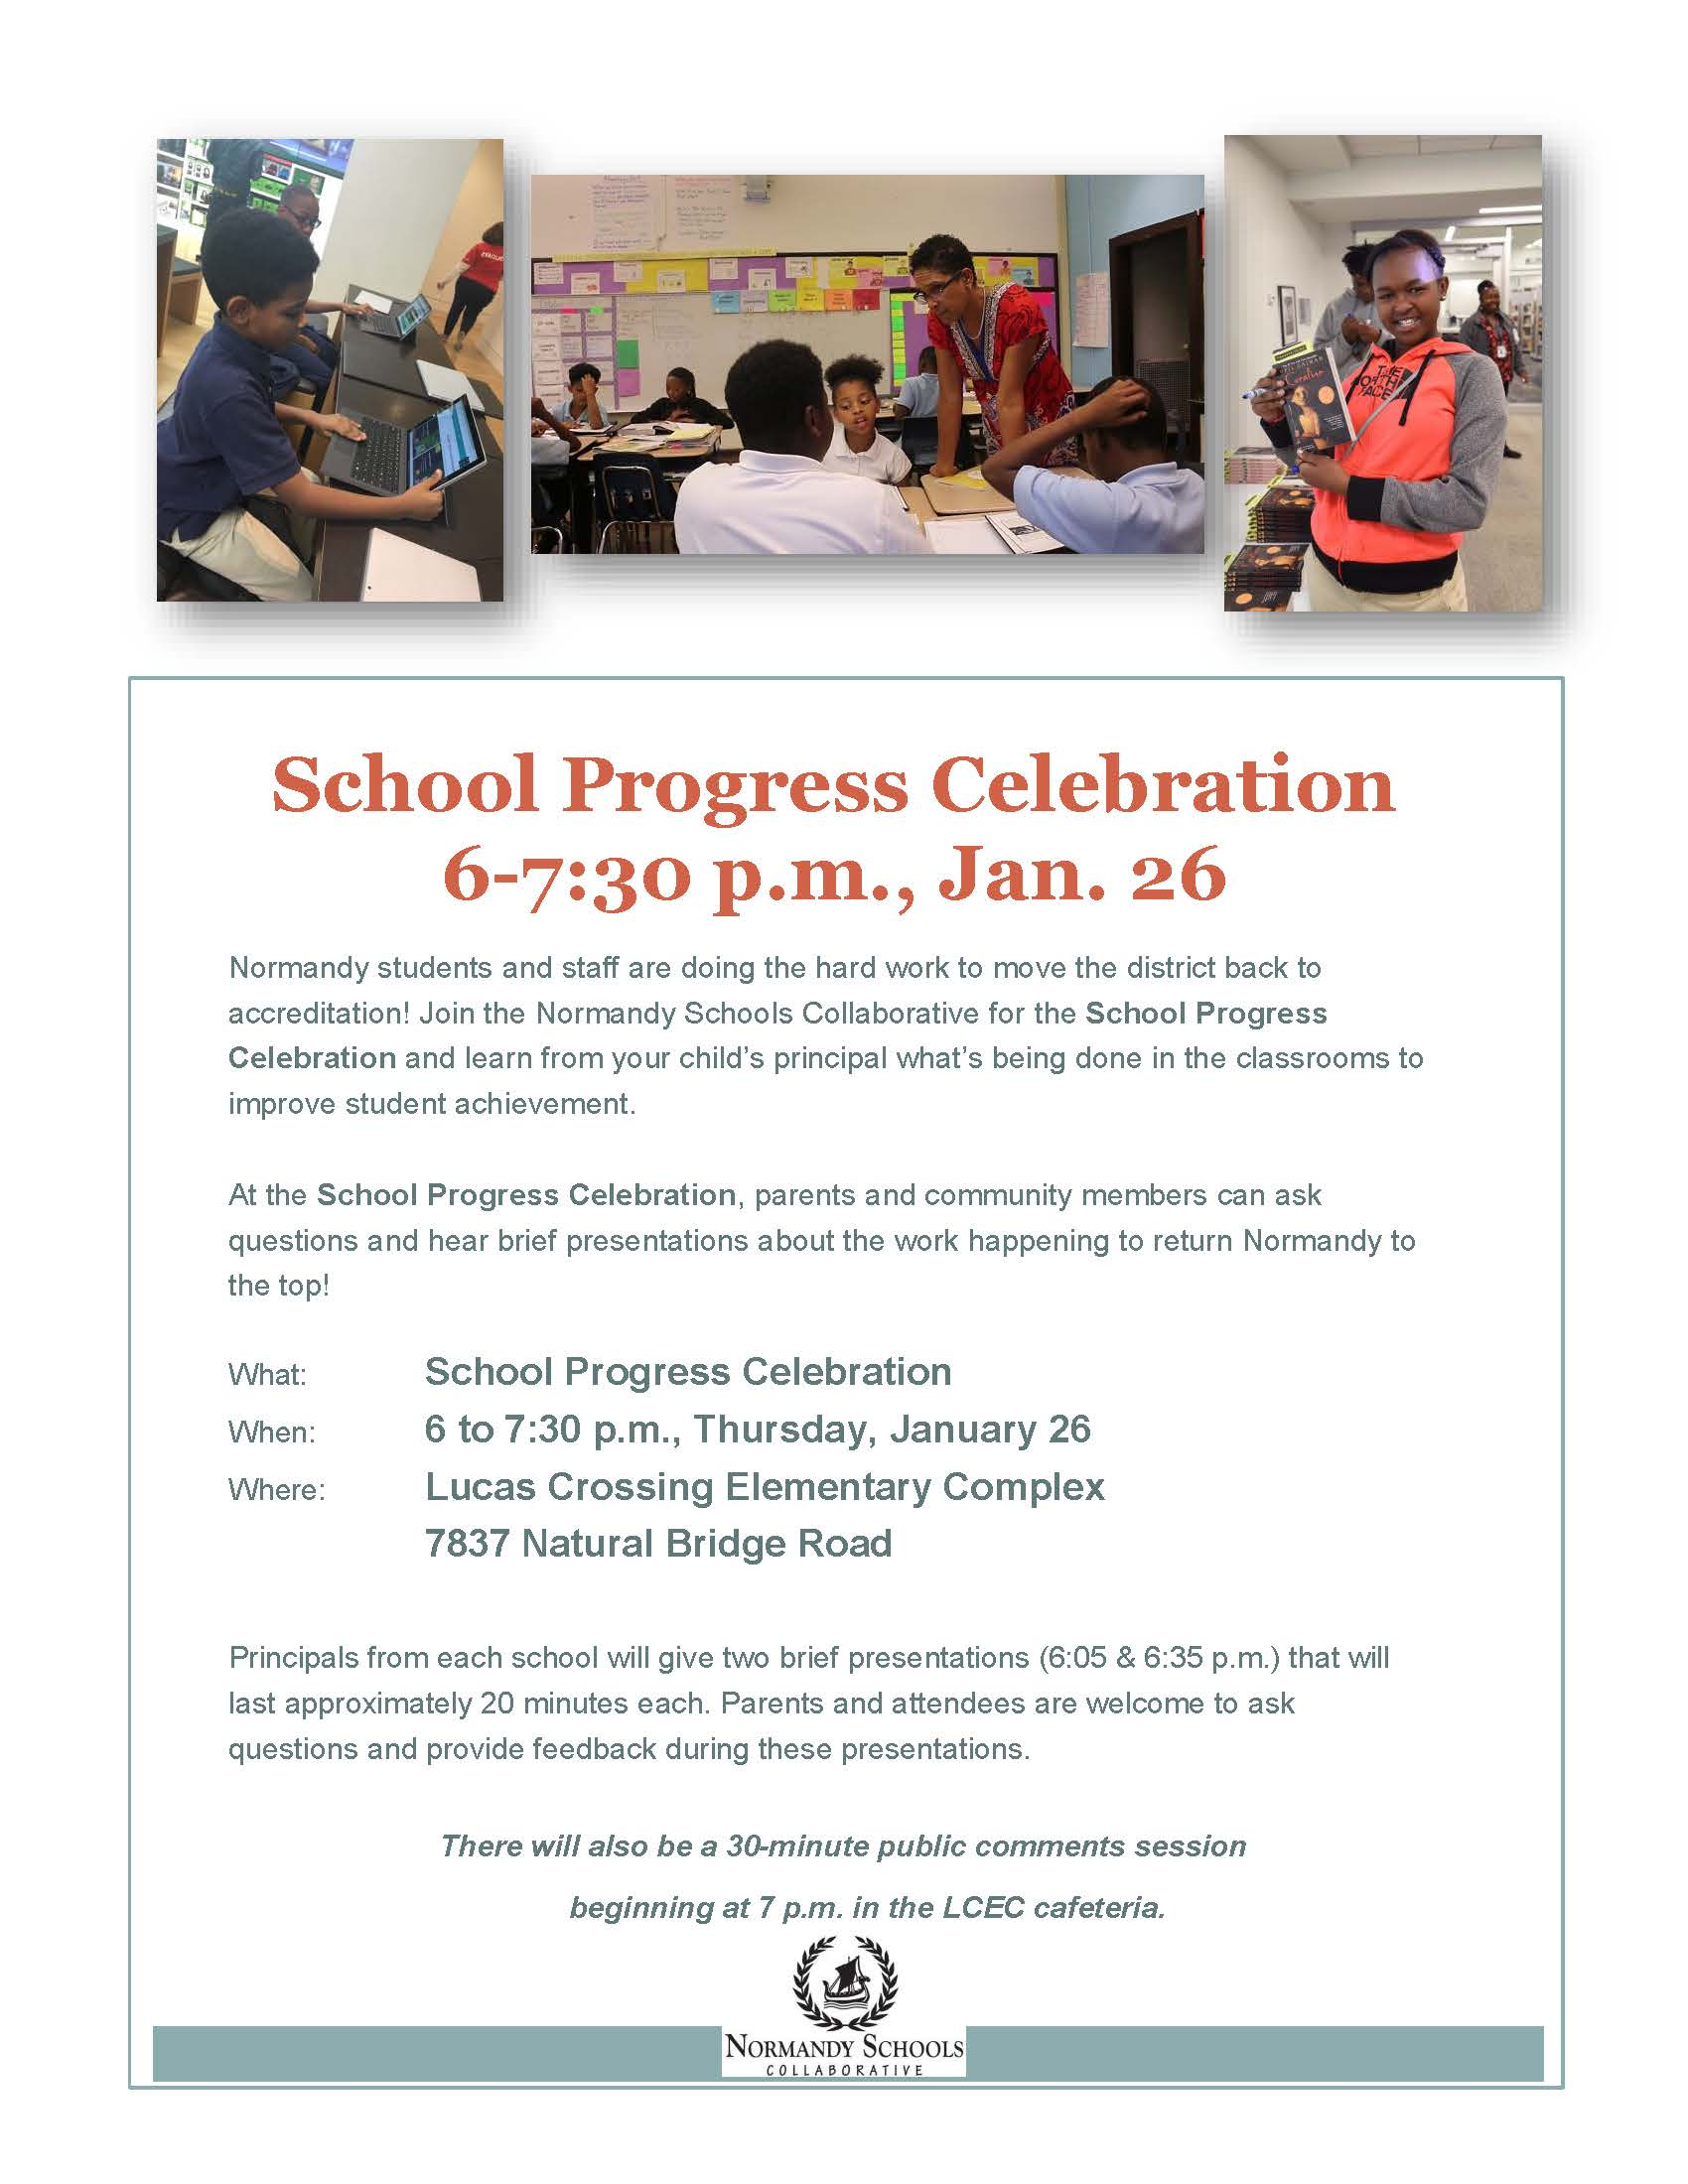 RSIT celebration flier